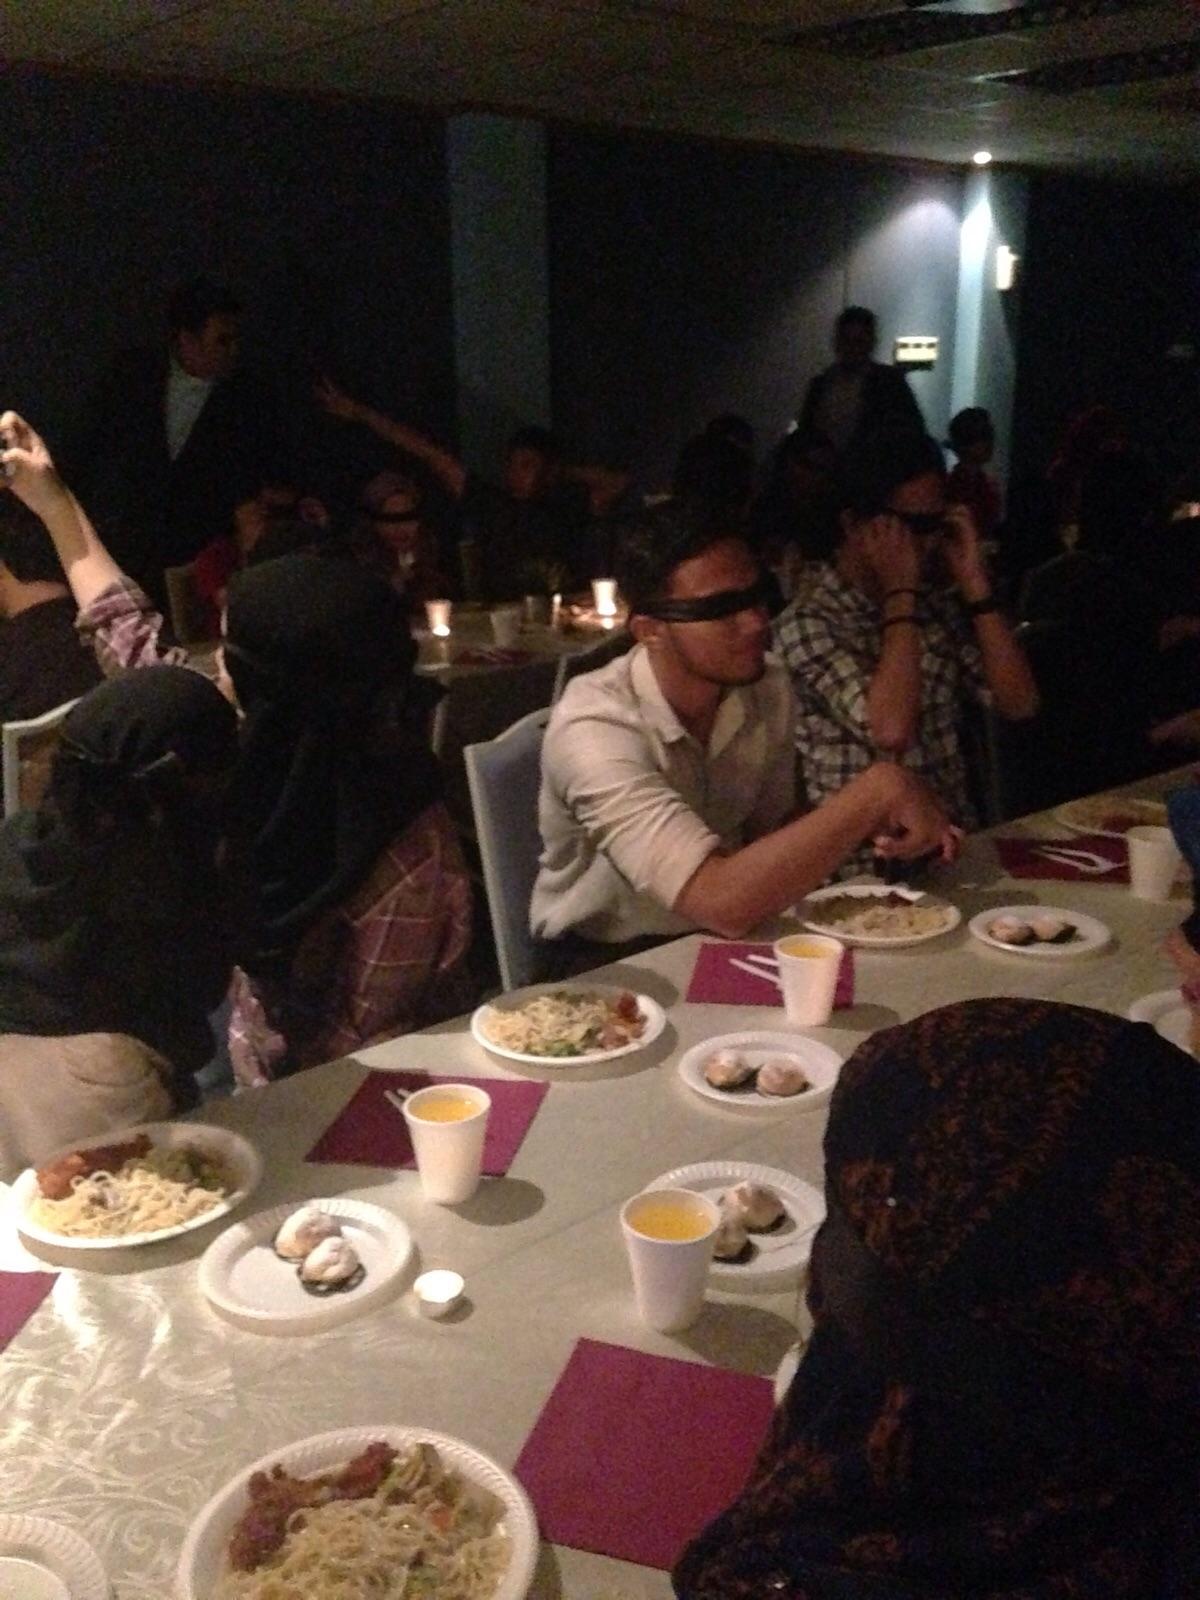 dans le noir dining in the dark 1